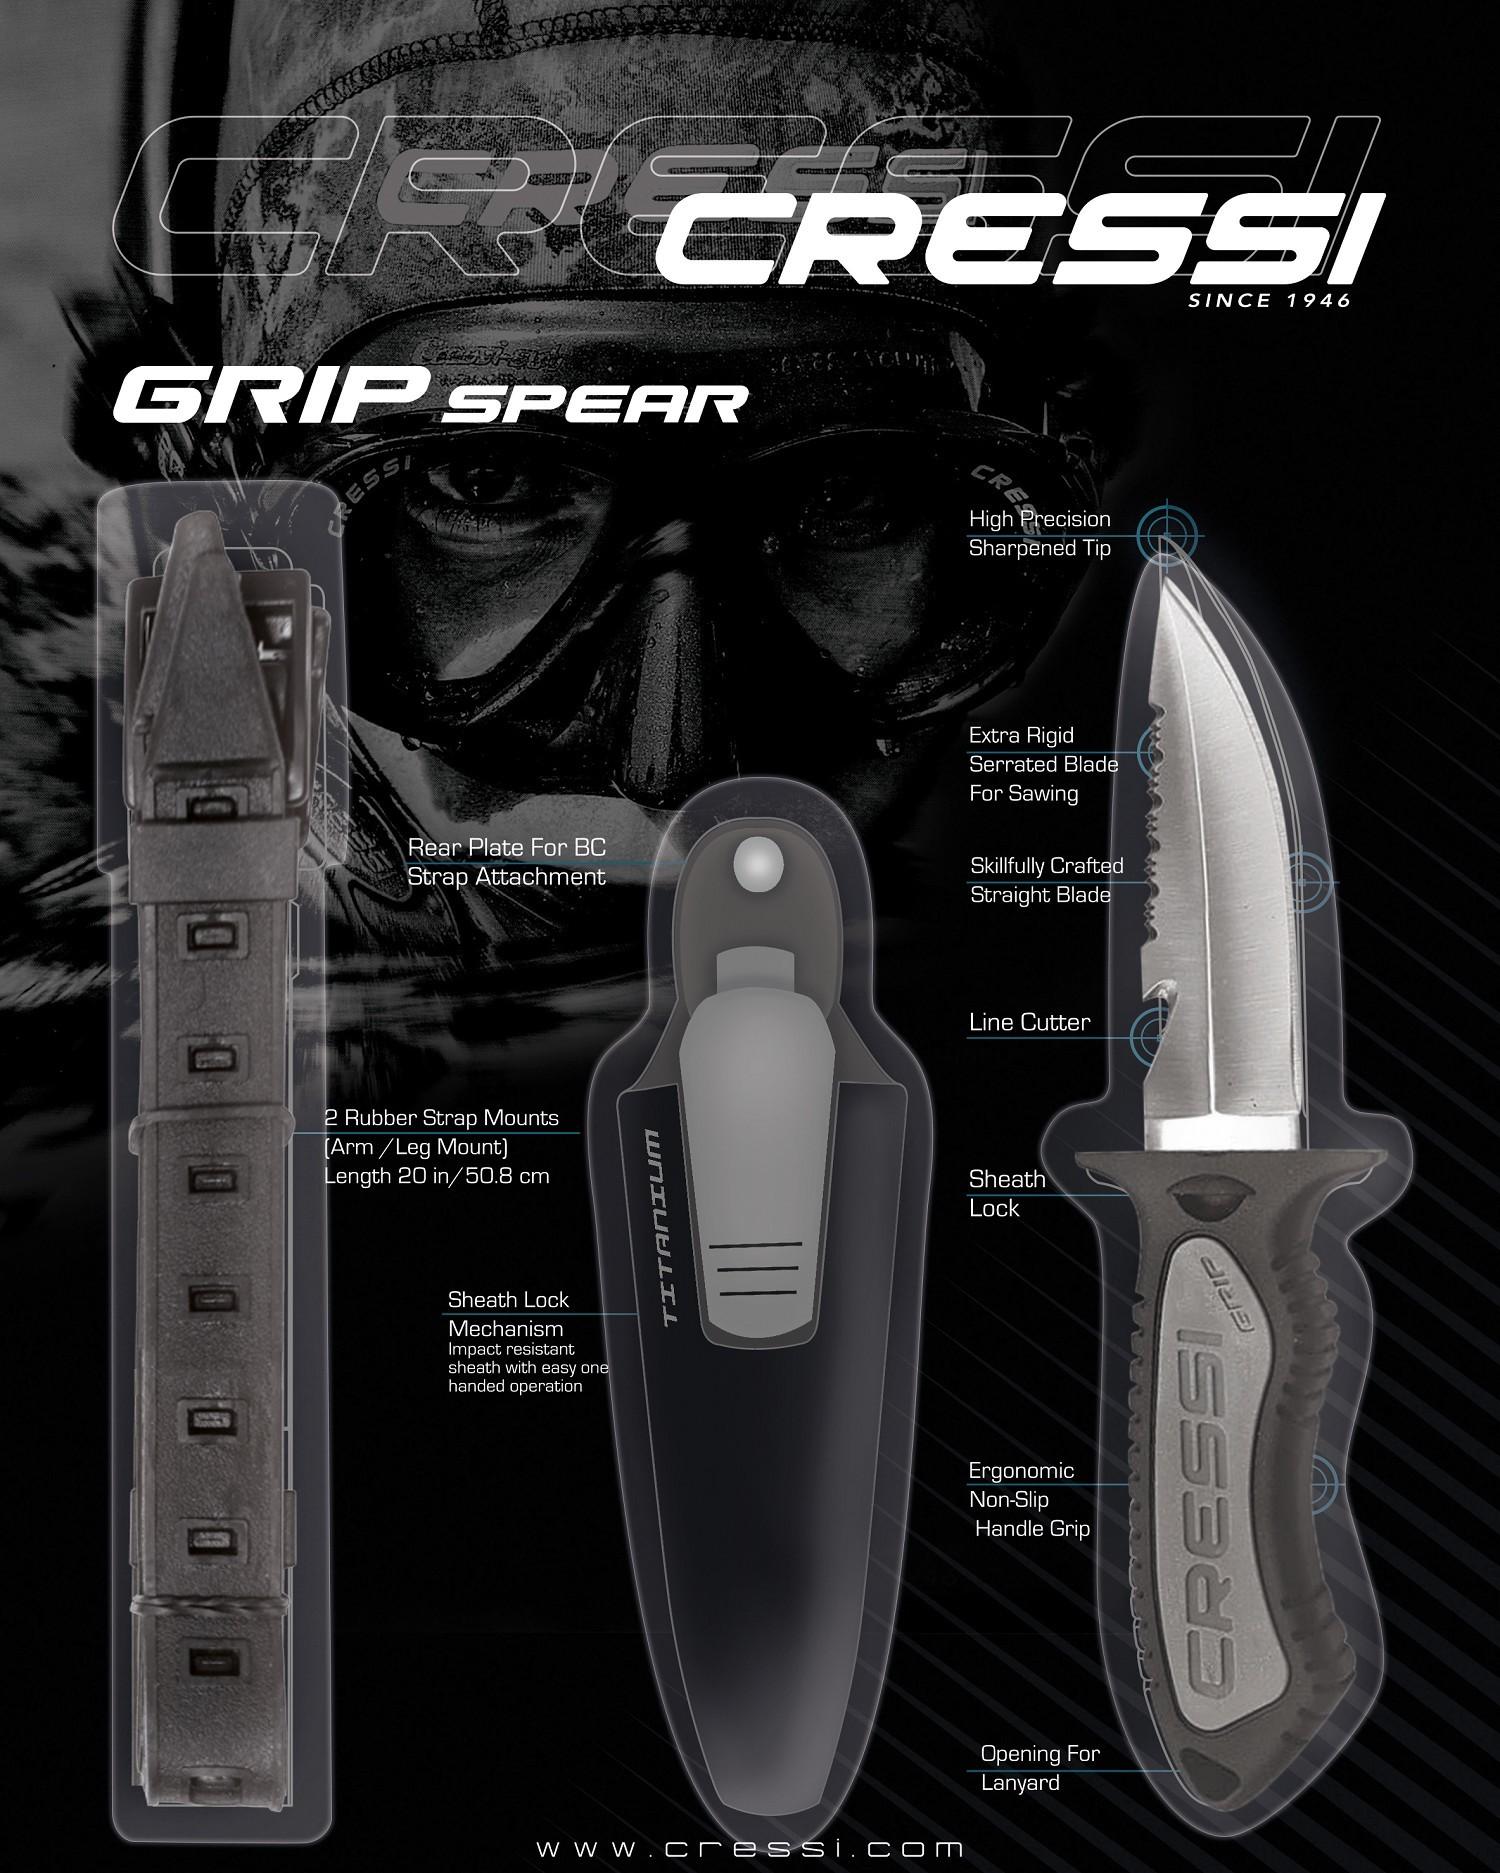 Cressi Grip spear knife